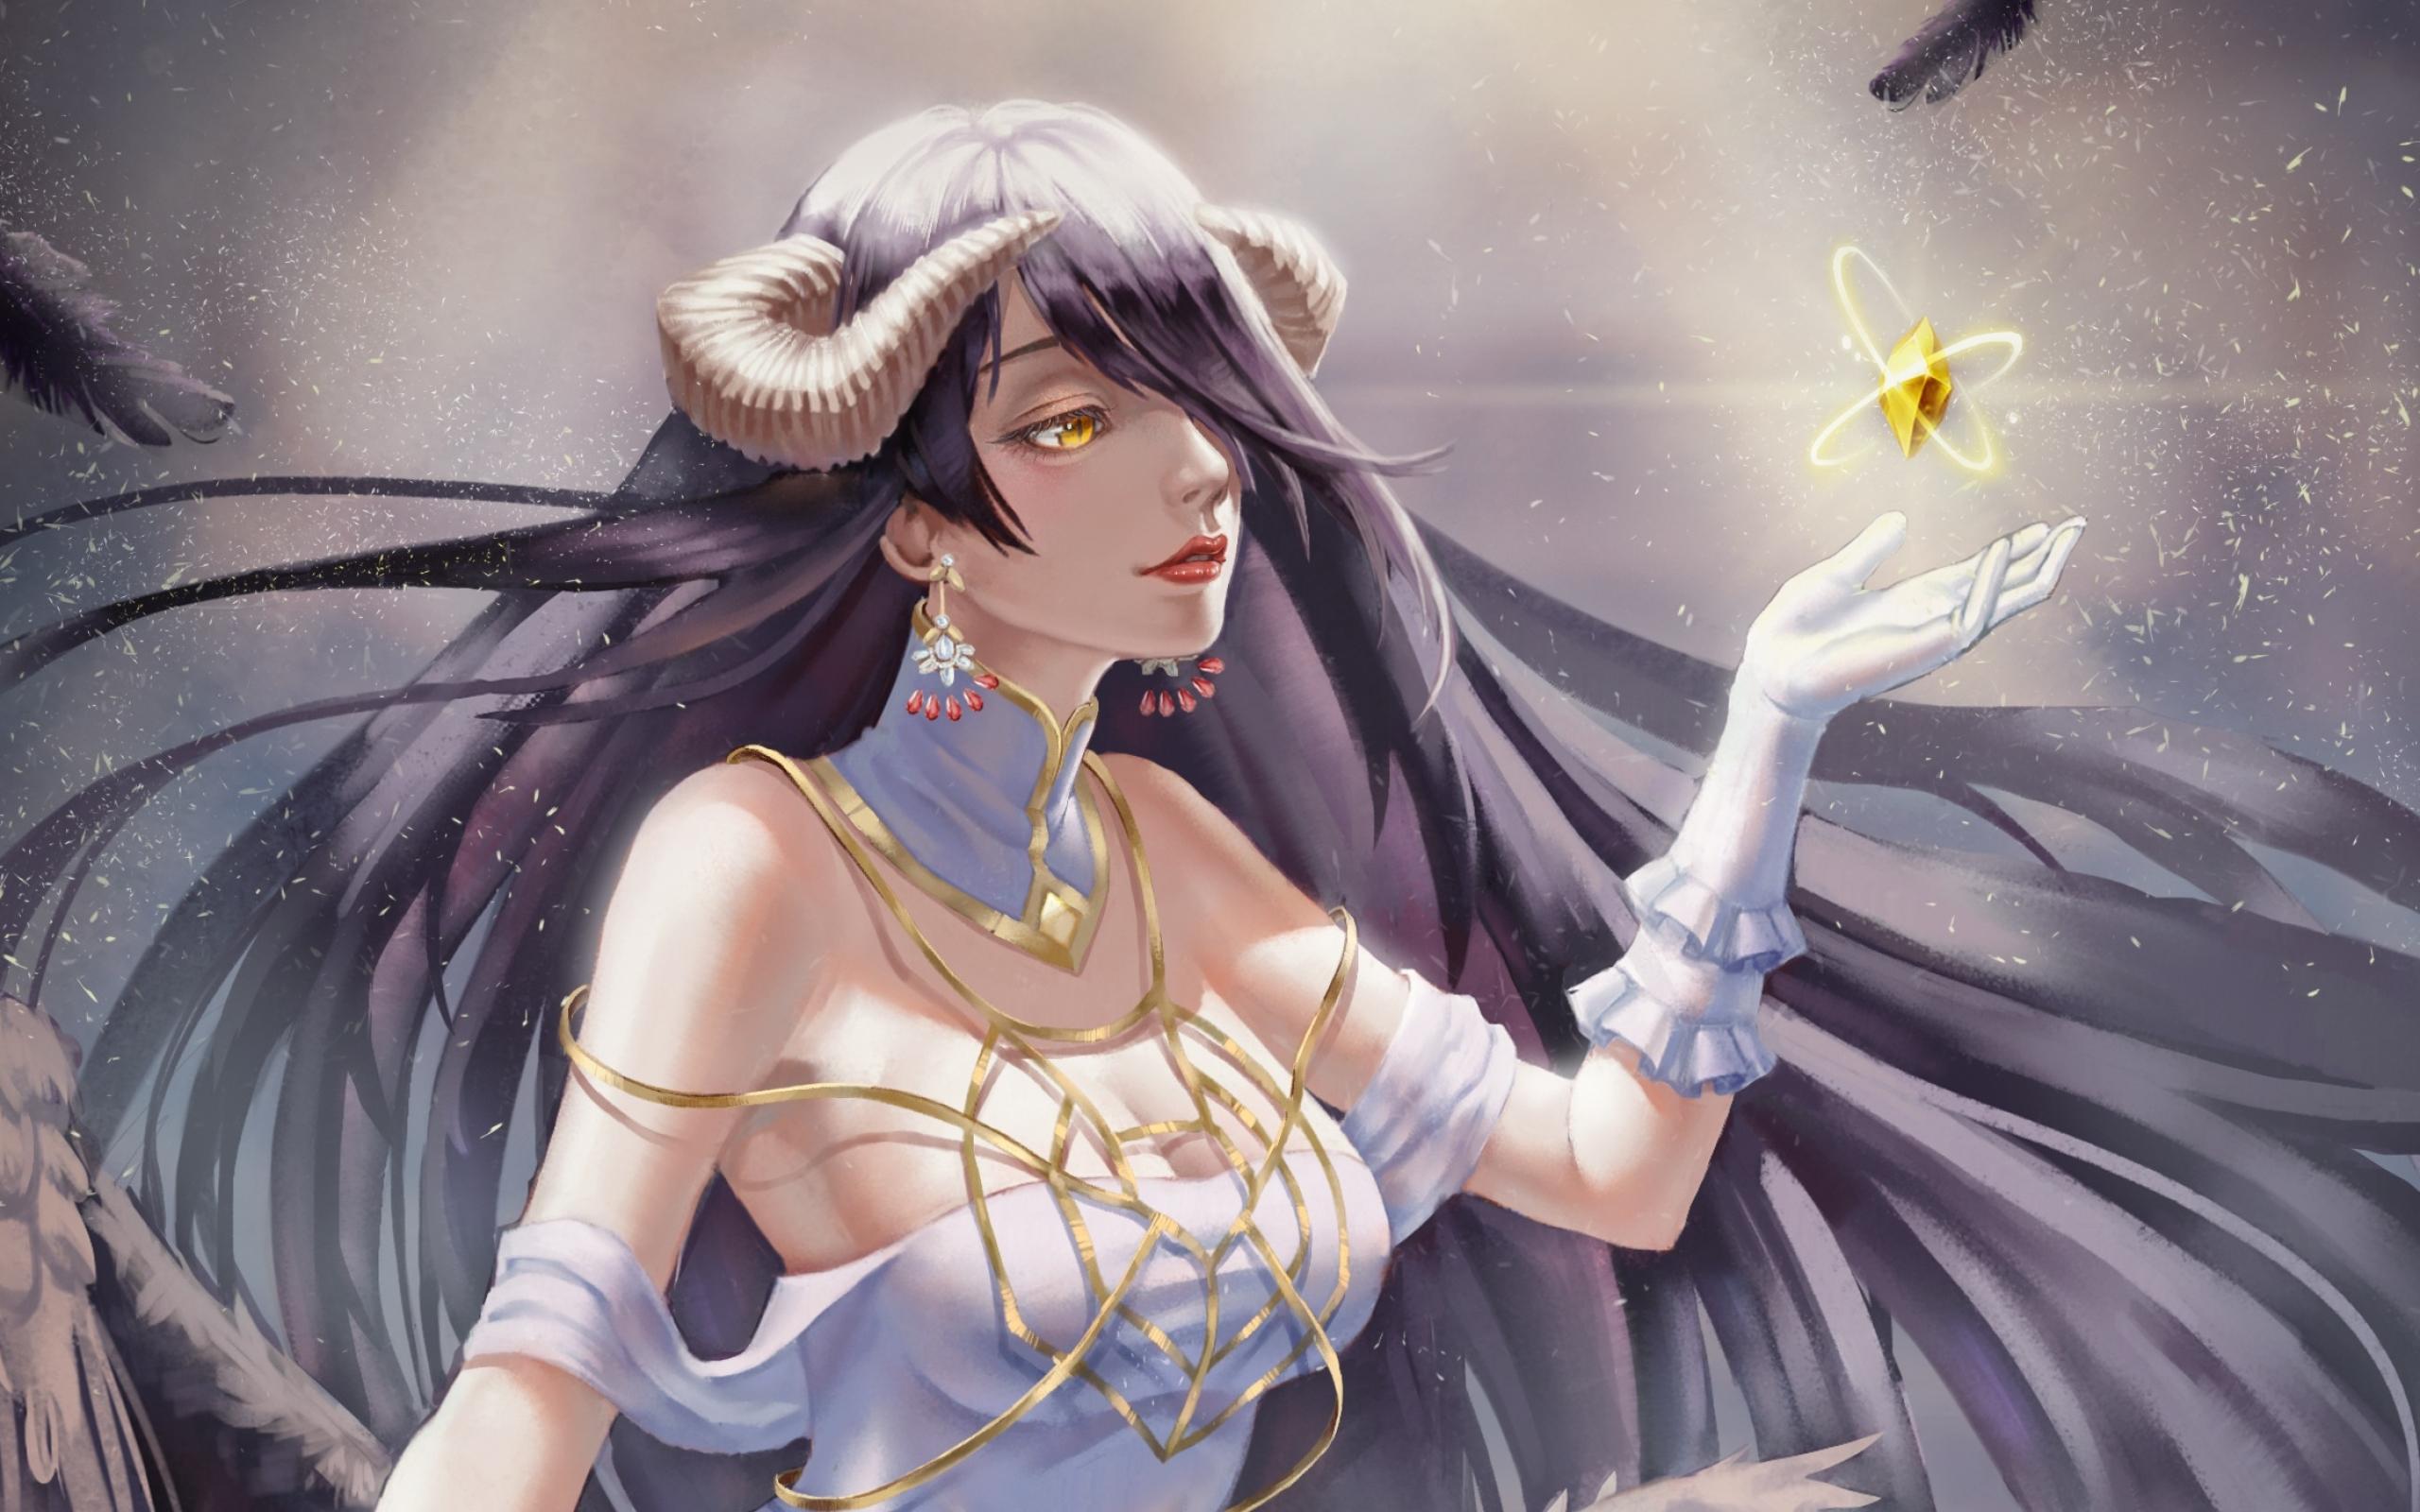 Wallpaper Of Anime Albedo Overlord Art Background Overlord Albedo Anime Backgrounds 2560x1600 Wallpaper Teahub Io